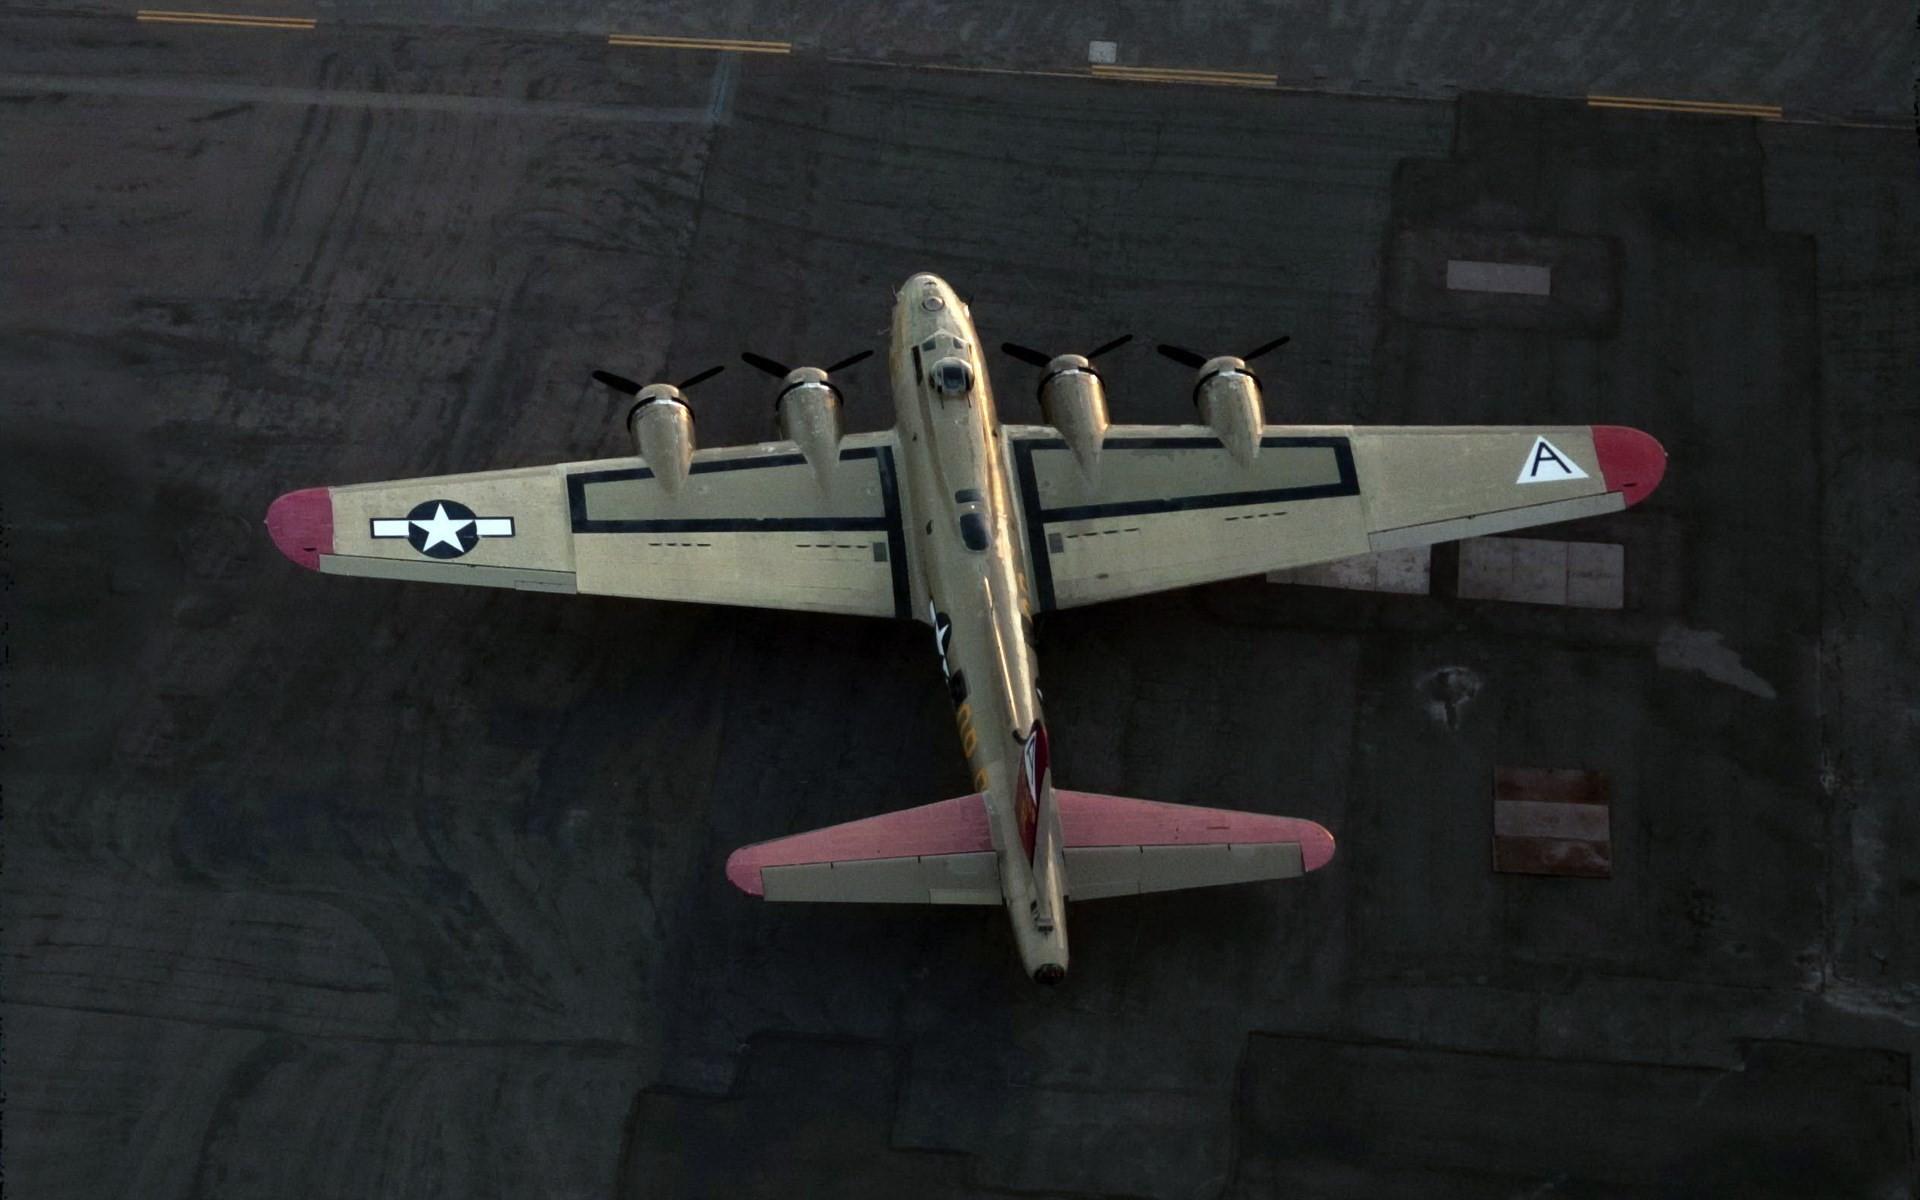 boeing b 17 flying fortress macbook wallpapers hd, 338 kB – Ervins Stevenson